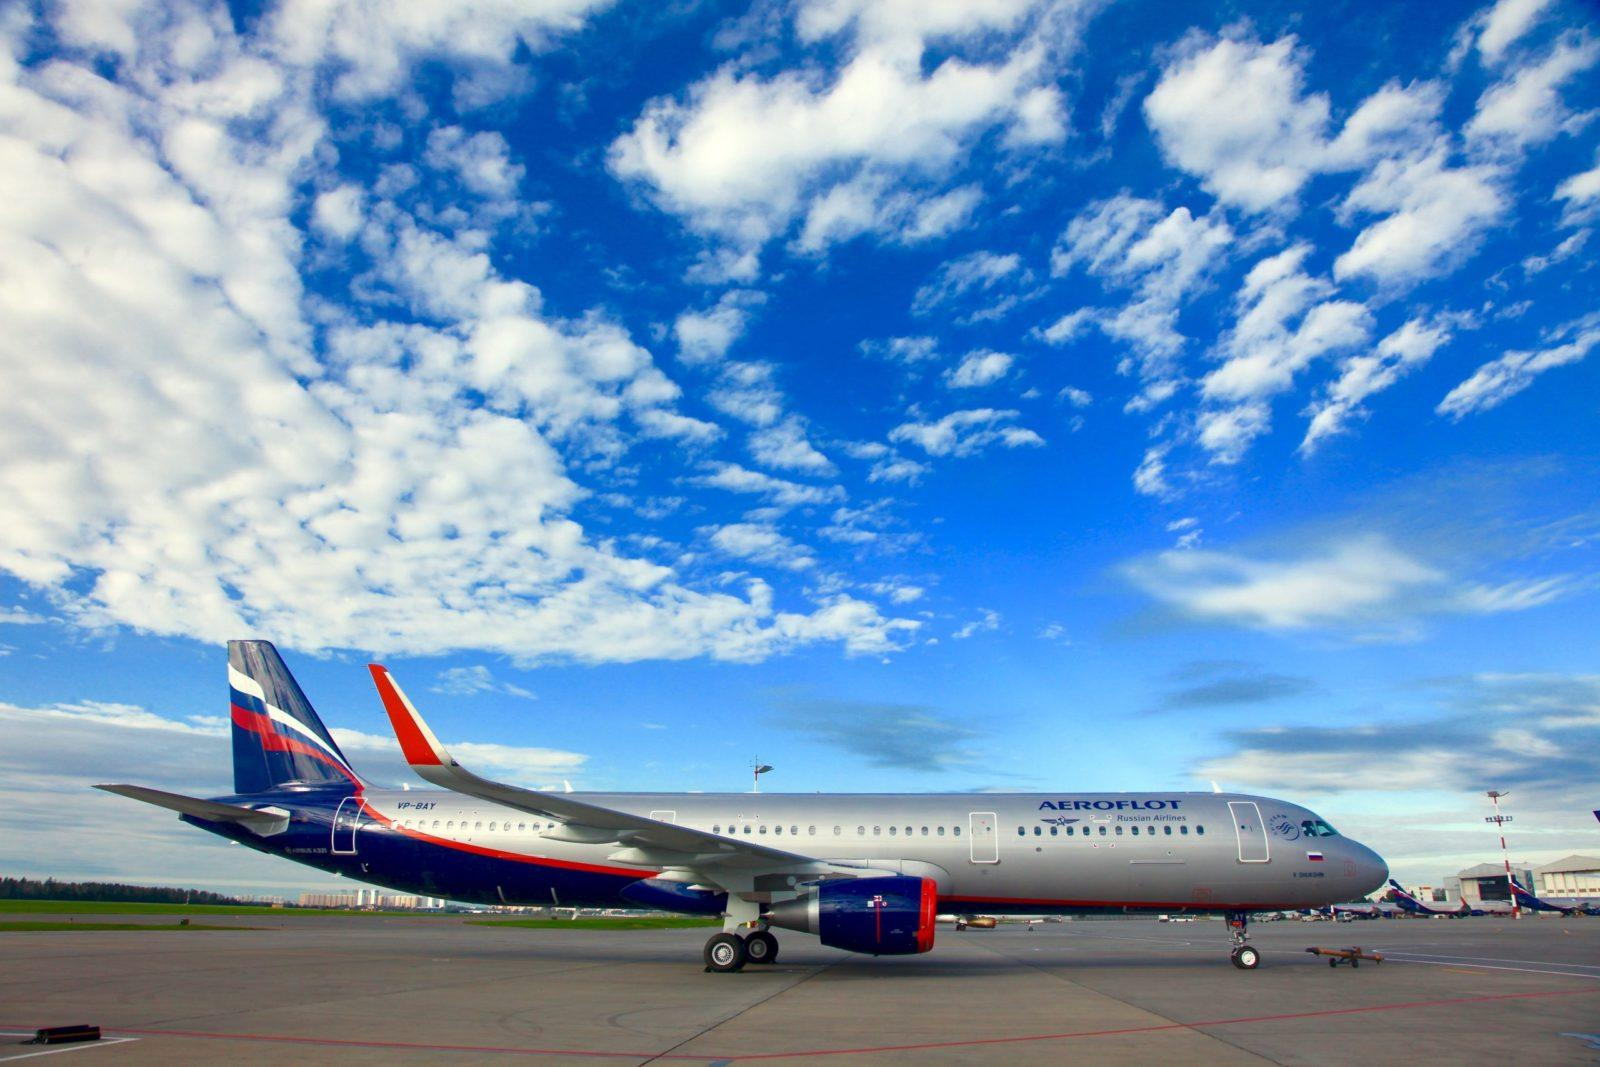 aeroflot scaled - ავიაკომპანია აეროფლოტი - Aeroflot